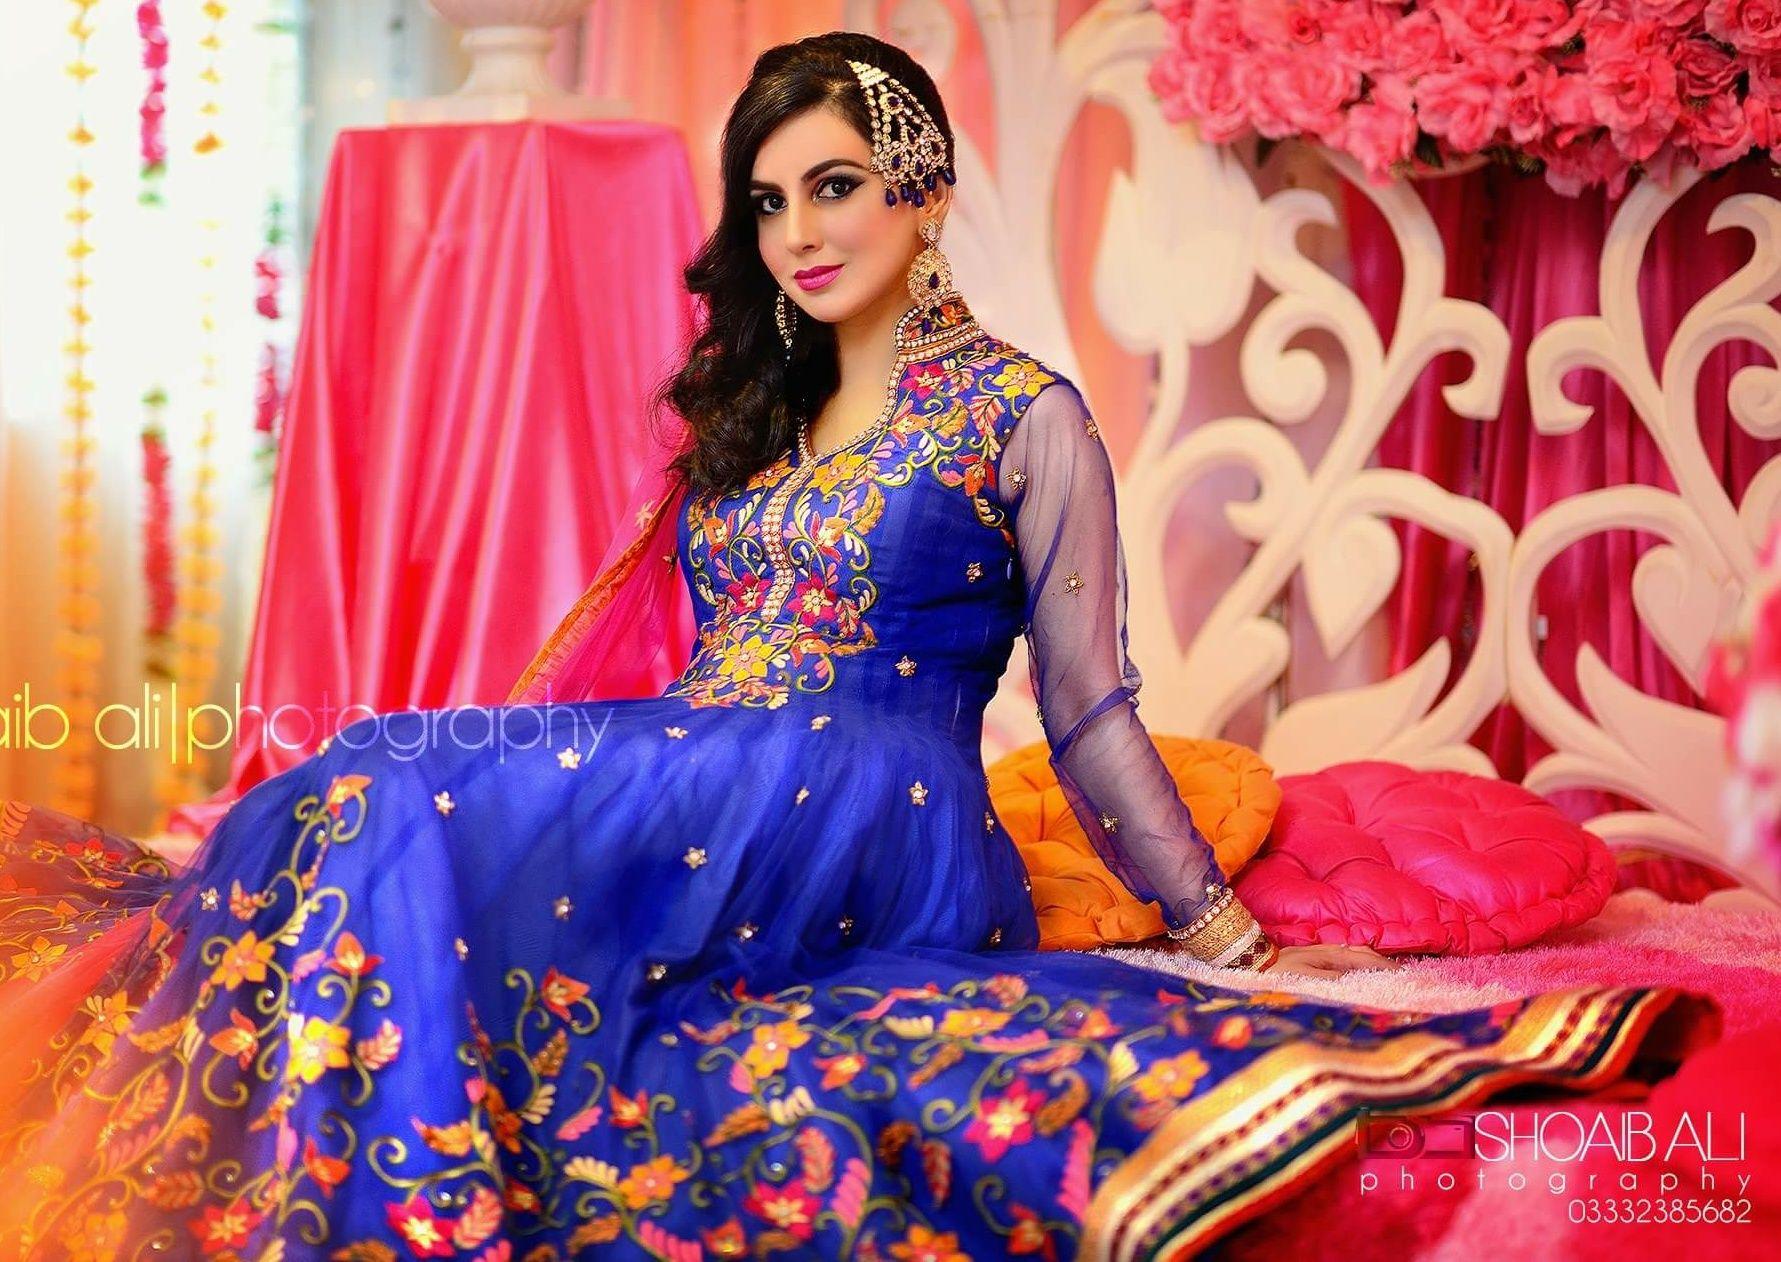 Mehndi Clothes For Brides : Shoaib ali photography mehndi bridal dress wear